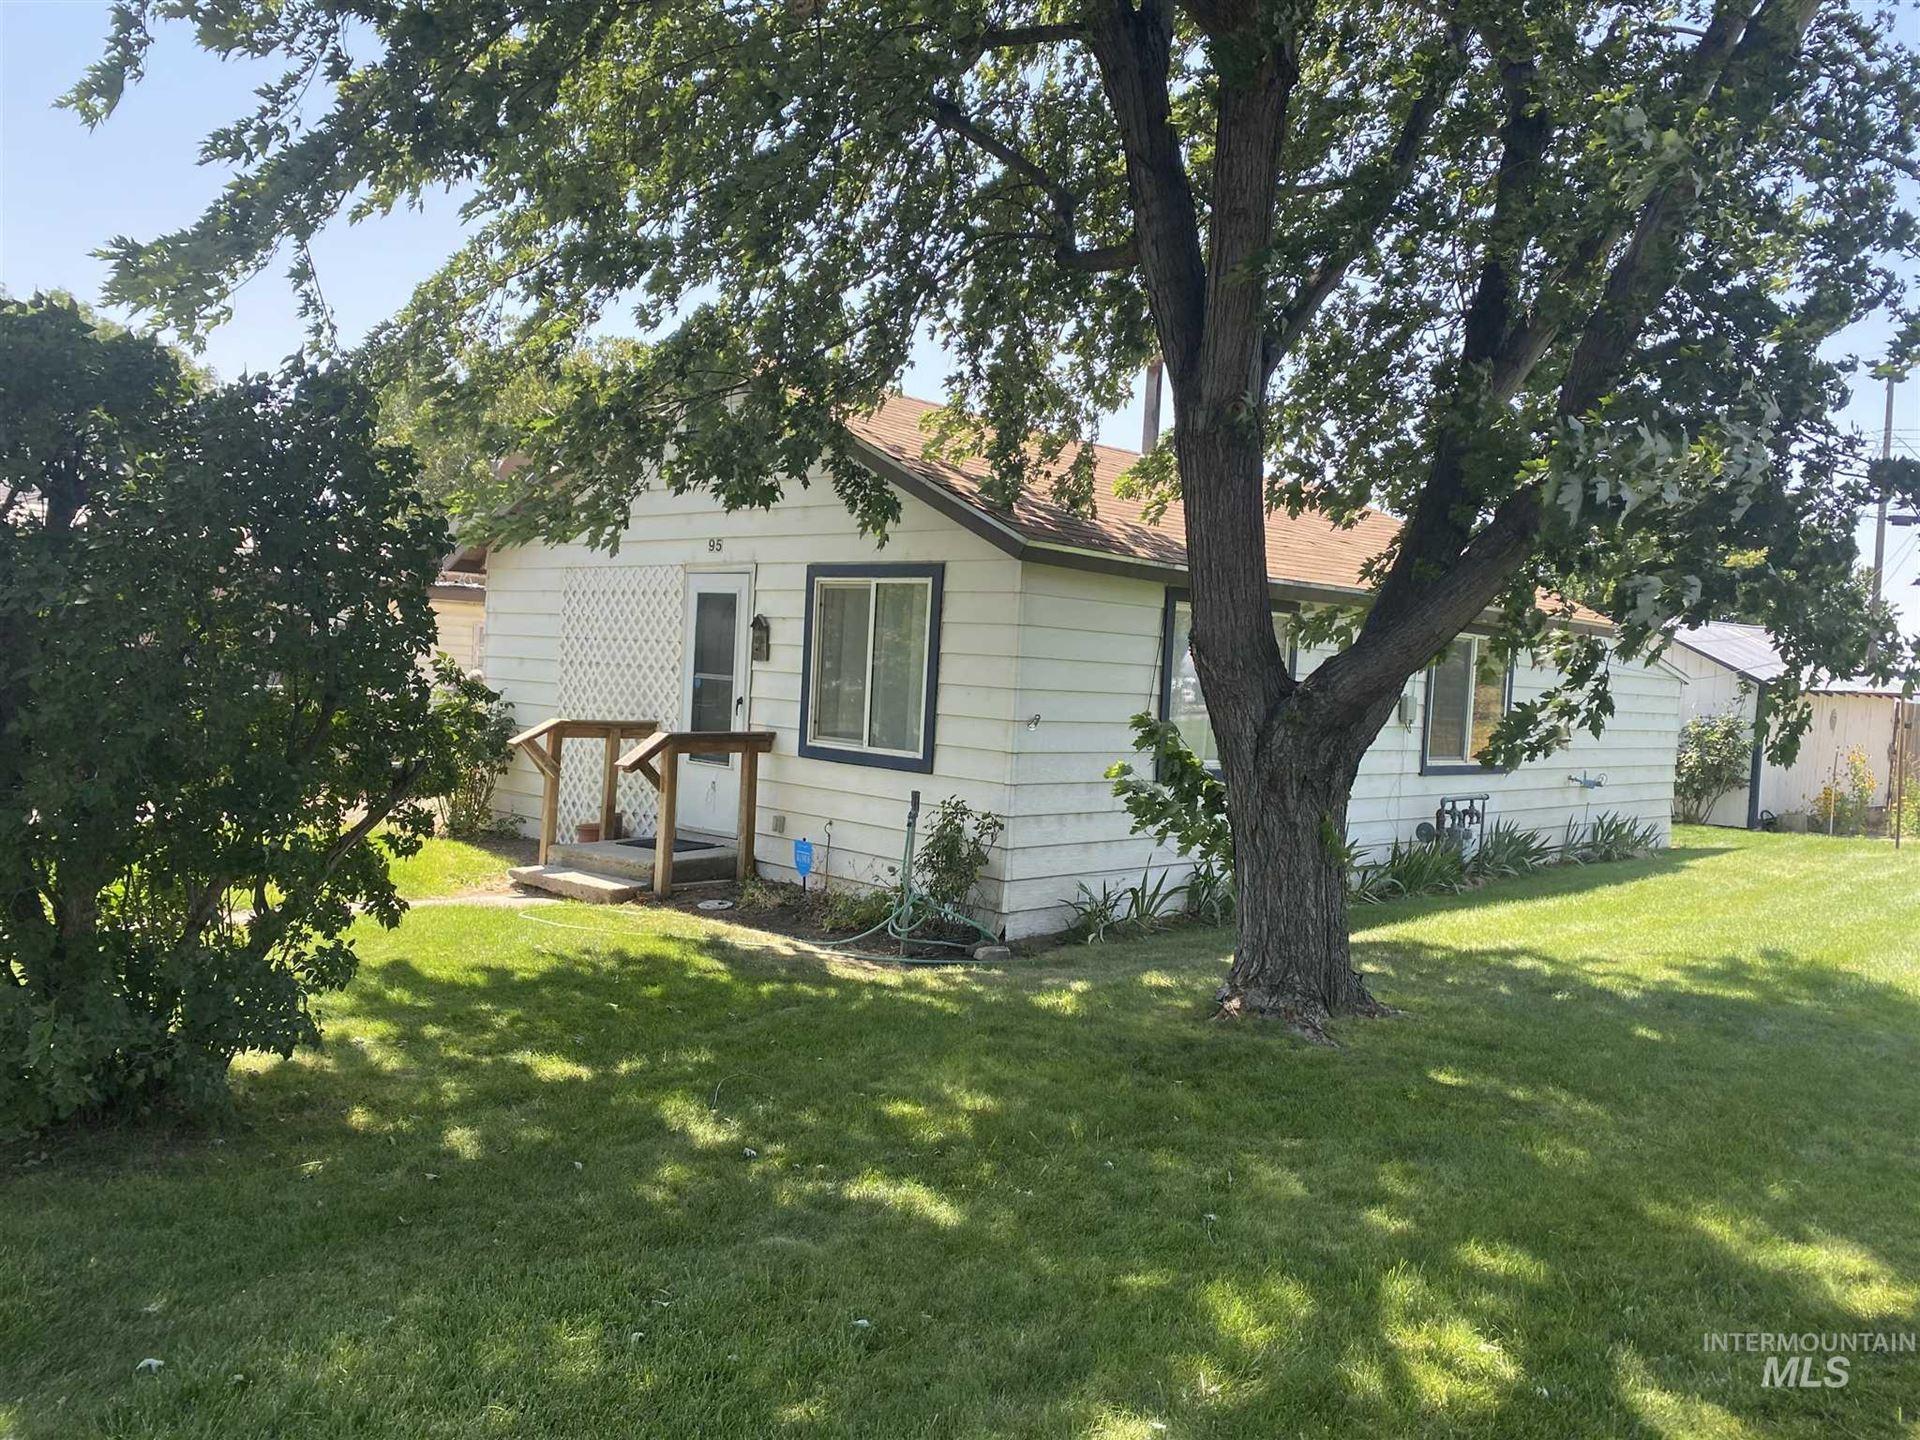 Photo of 95 N Kansas Ave, Glenns Ferry, ID 83623 (MLS # 98776604)